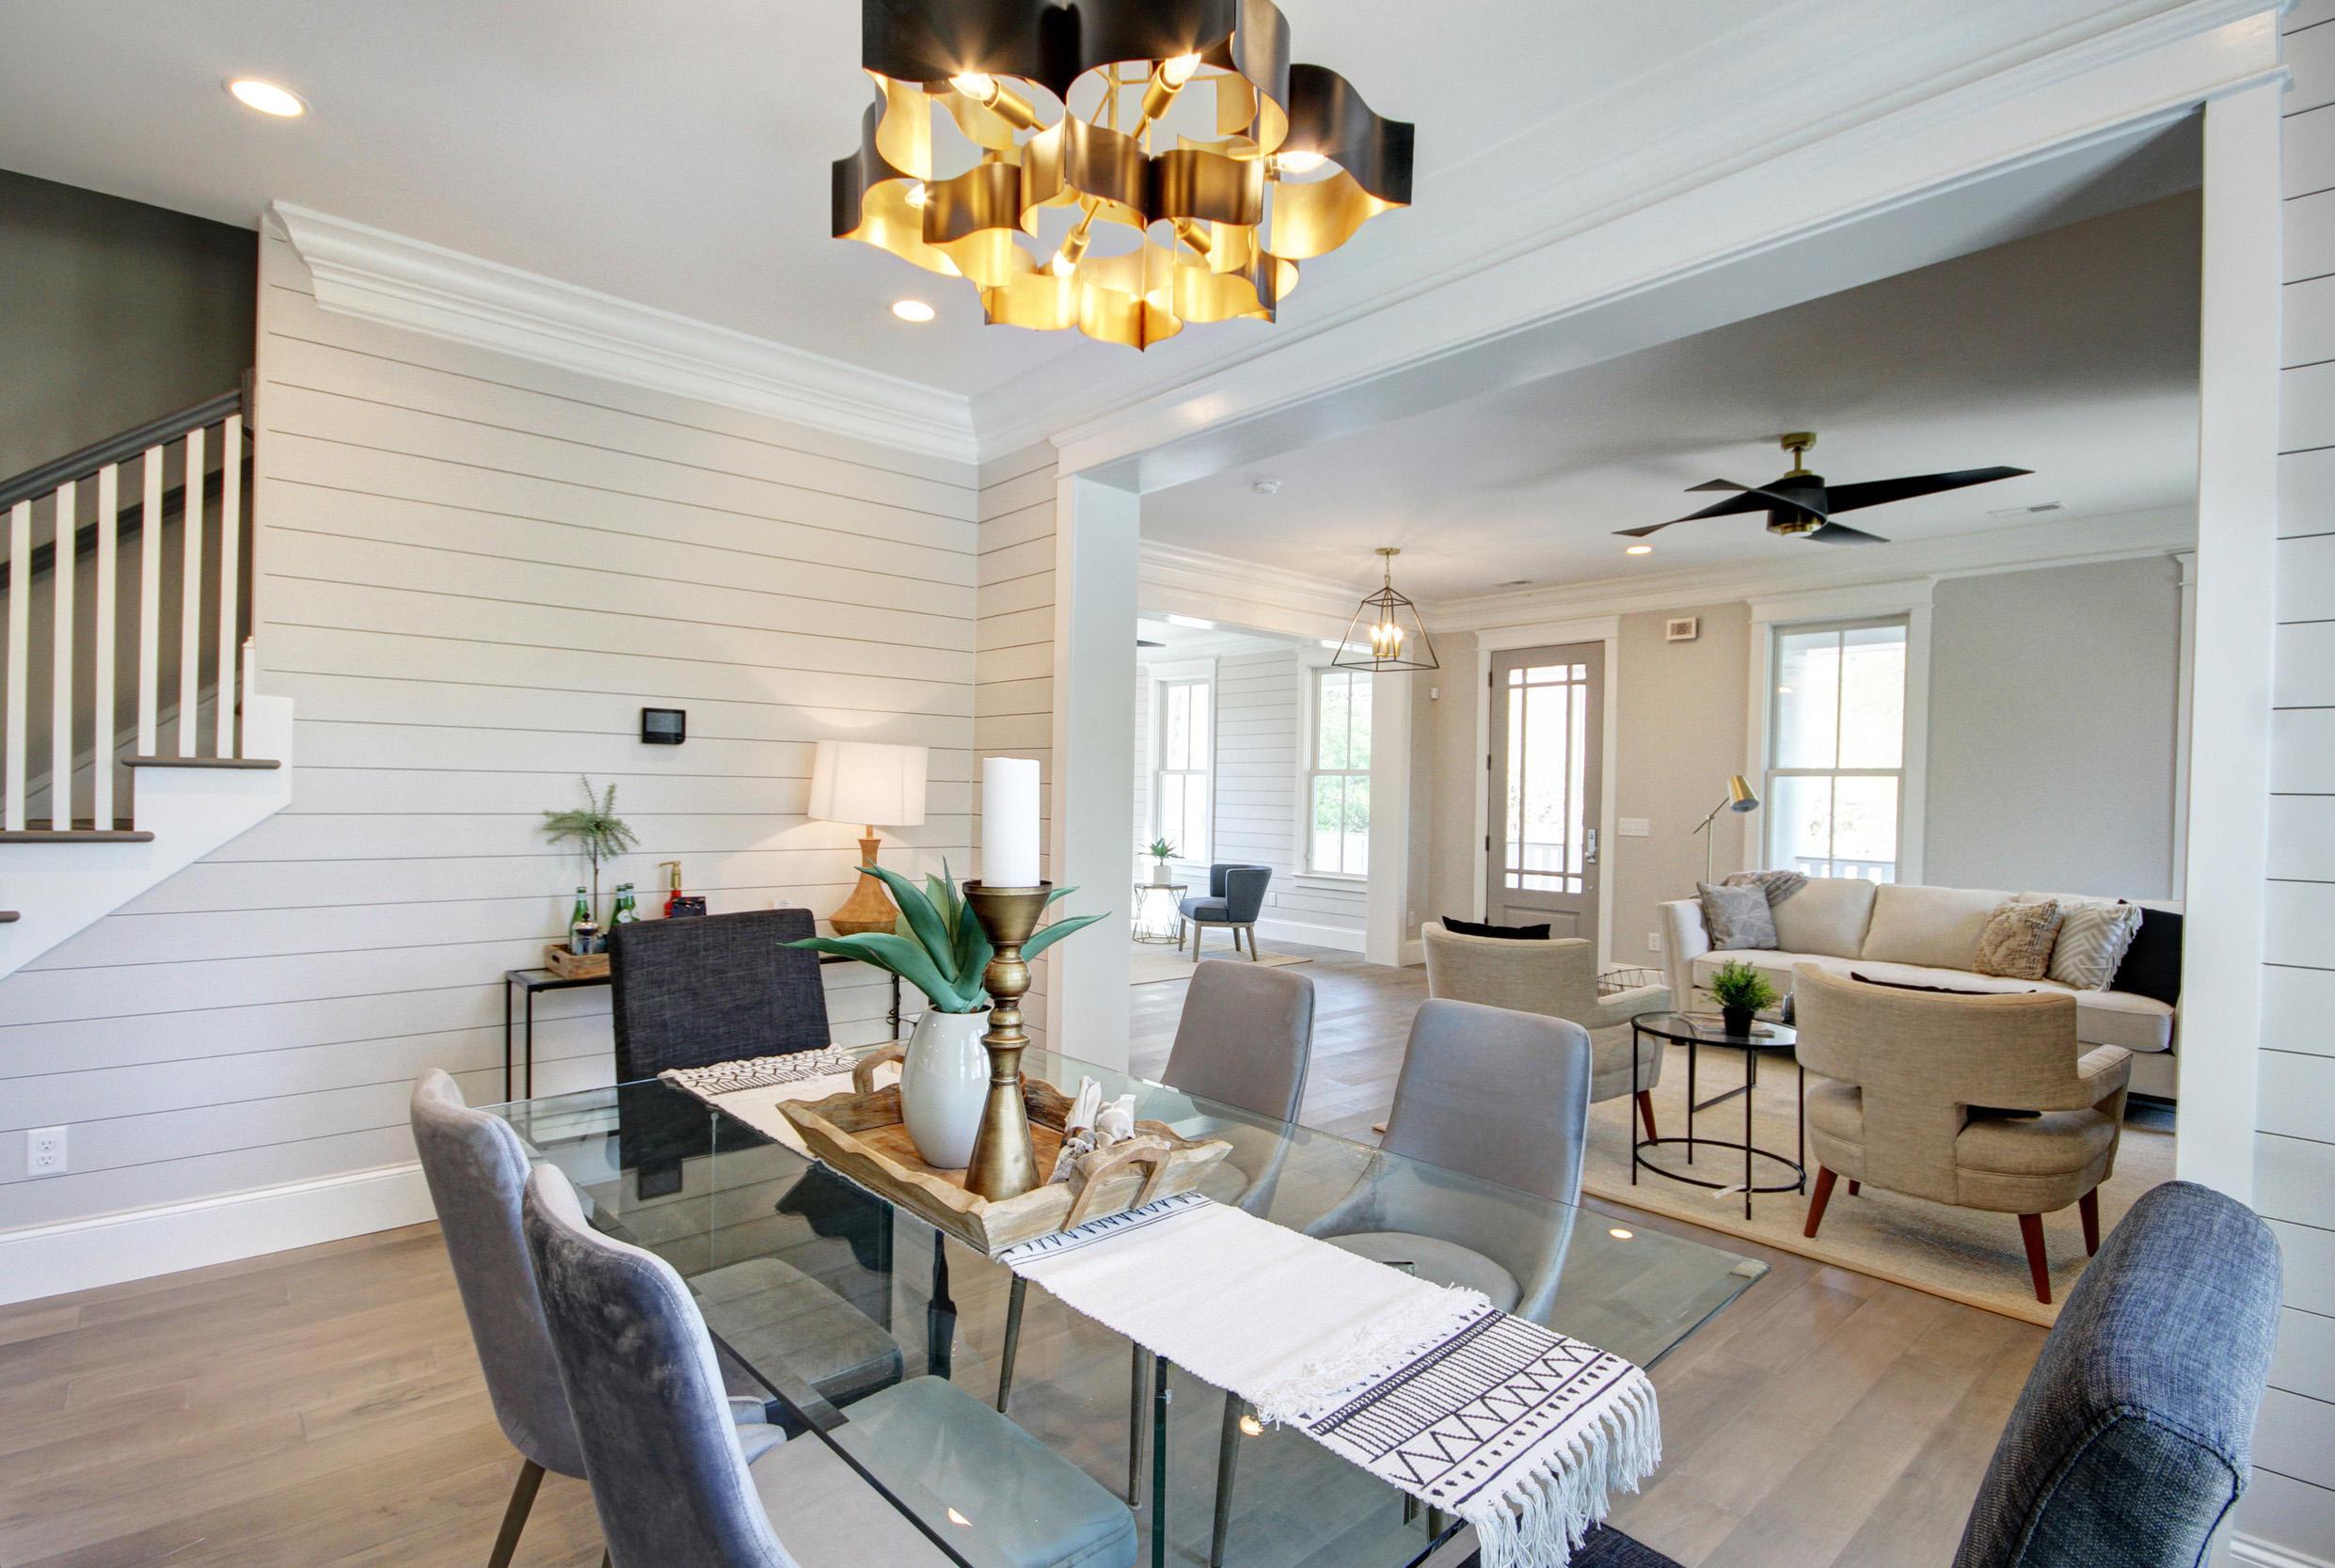 Mathis Ferry Court Homes For Sale - 1212 Clonmel, Mount Pleasant, SC - 13